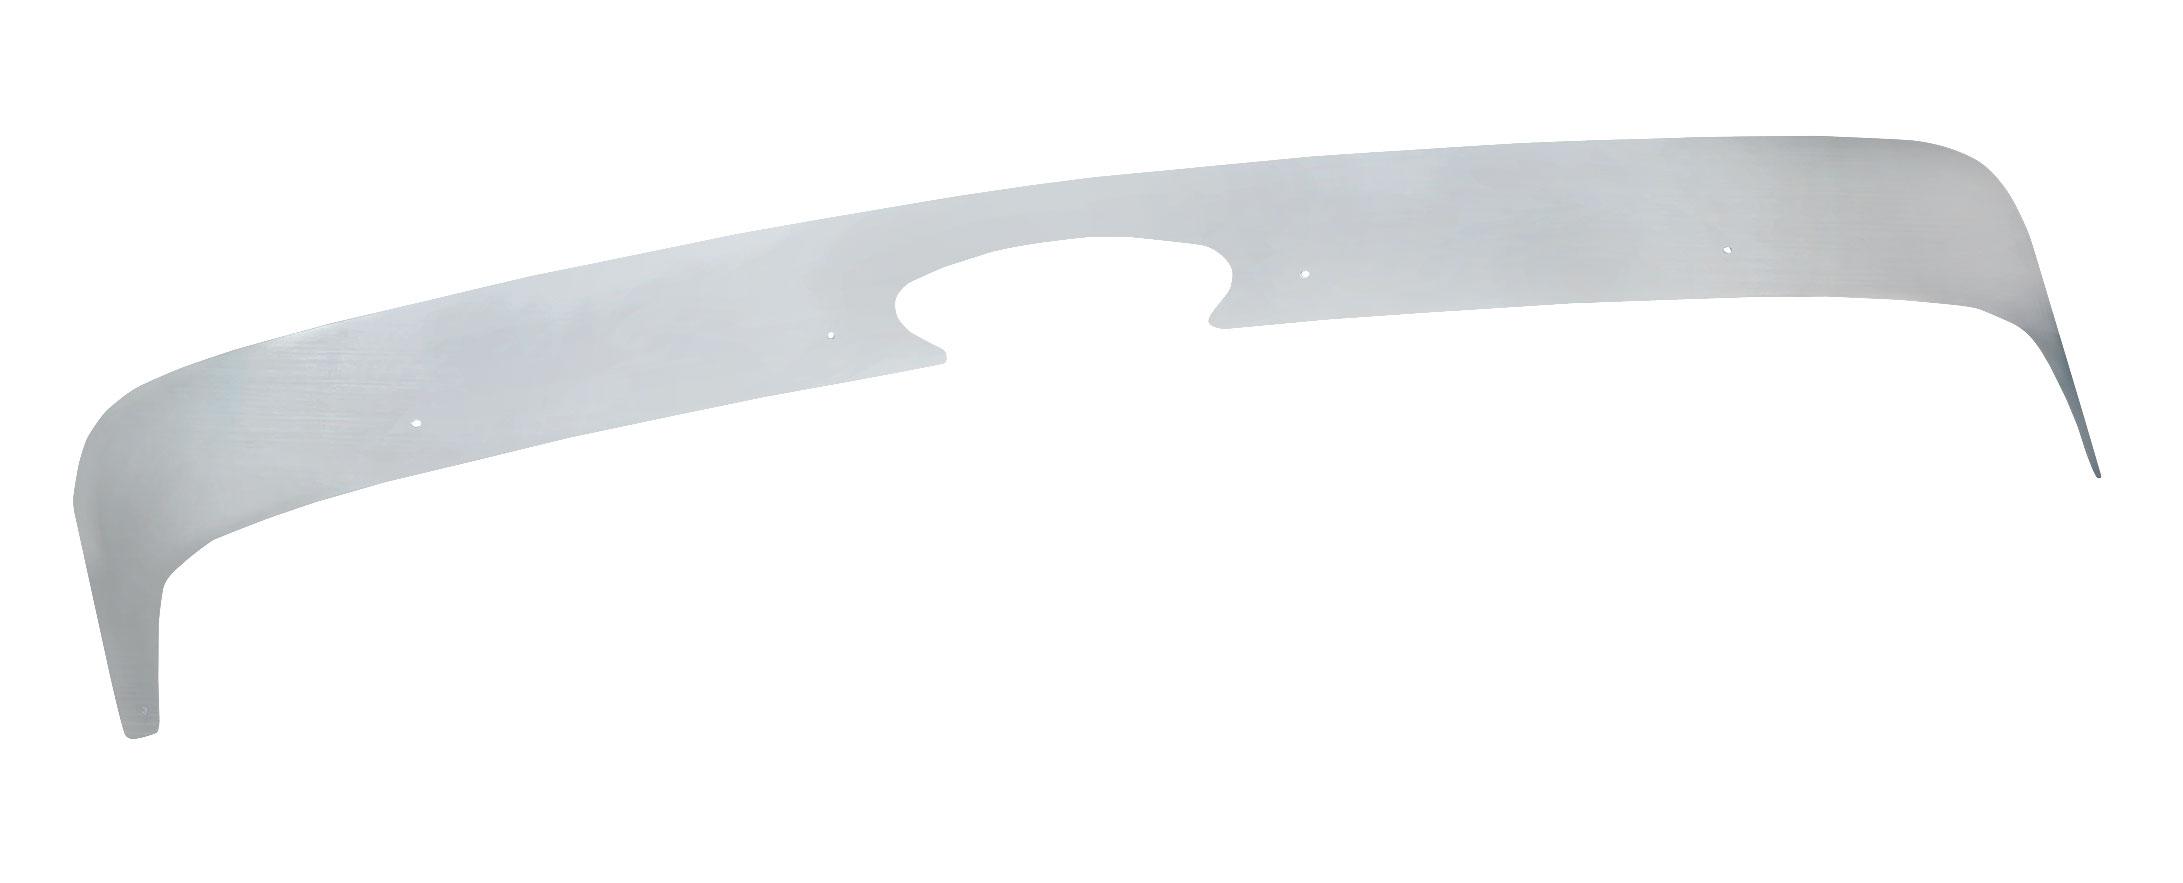 Peterbilt Hood Accessories 29001